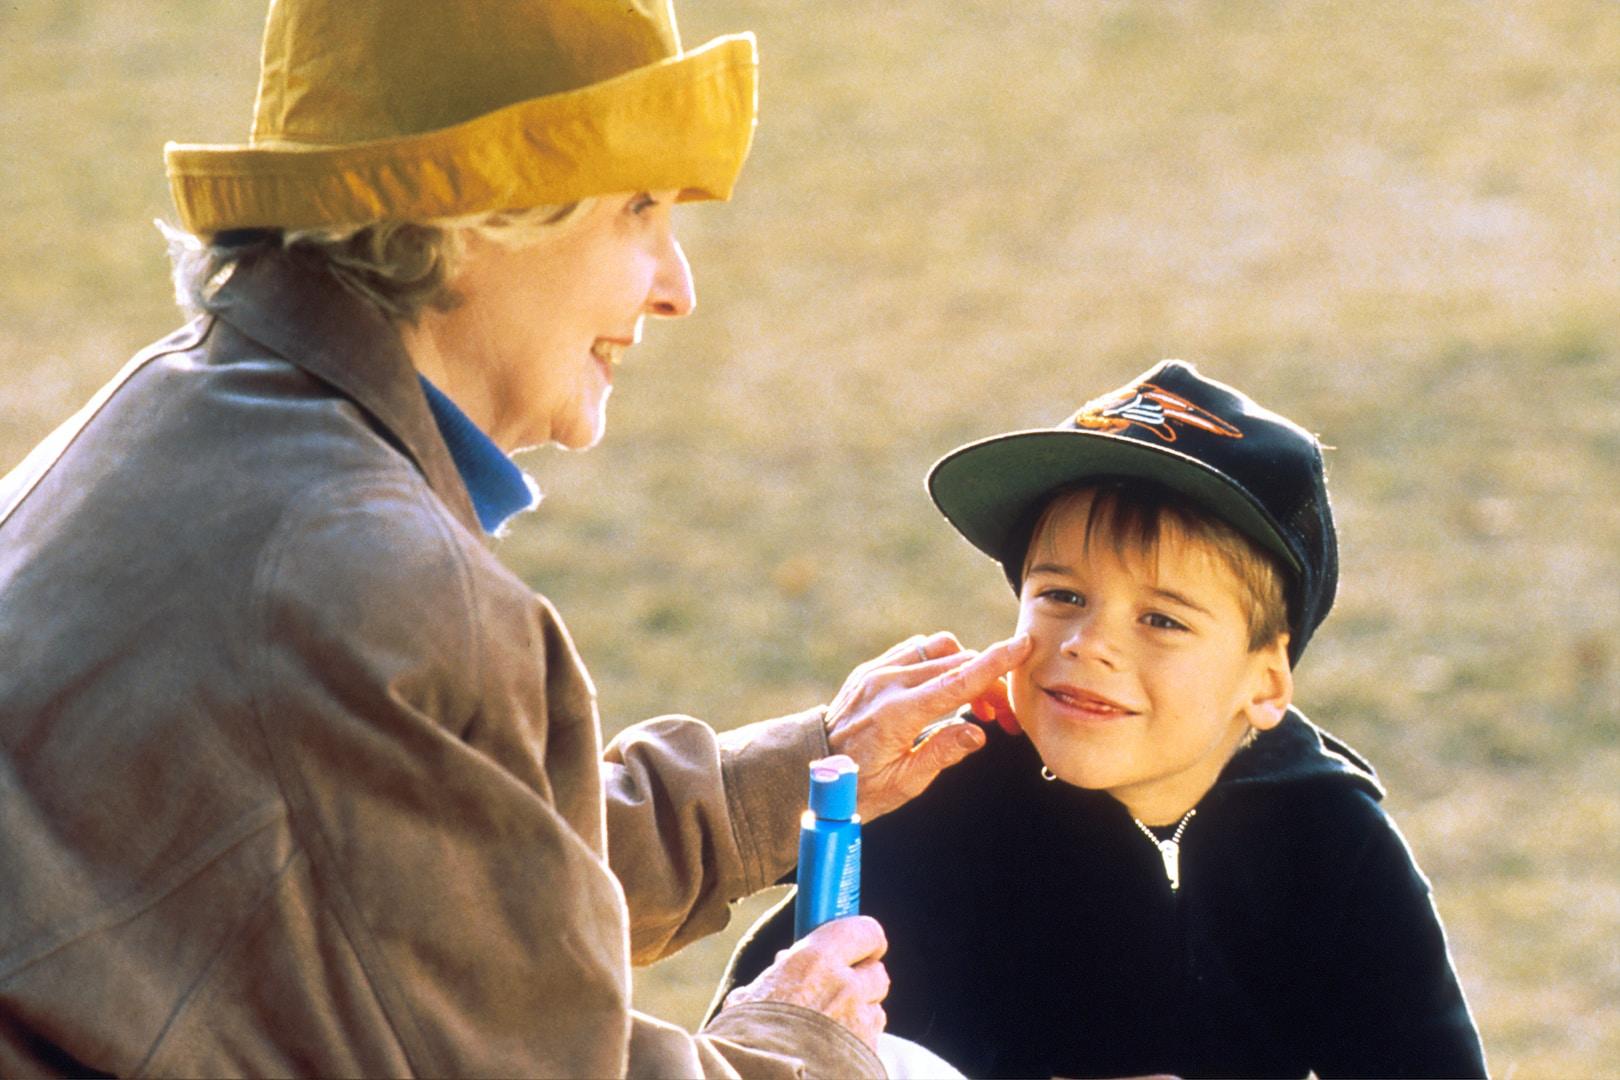 Granmom applying sunscream to grandson